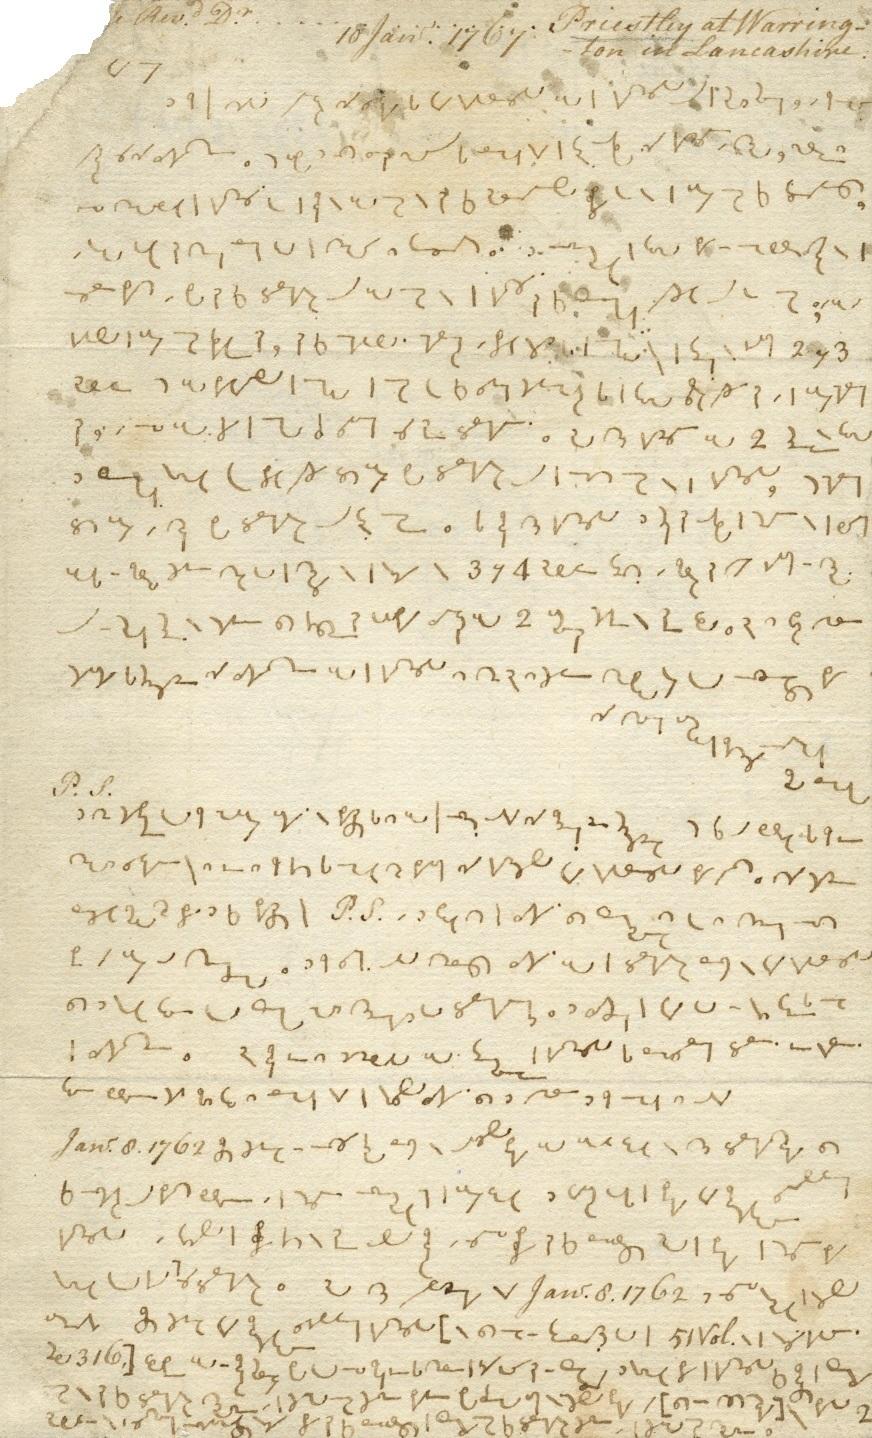 Lot 204 - [PRIESTLEY JOSEPH]: (1733-1804) English